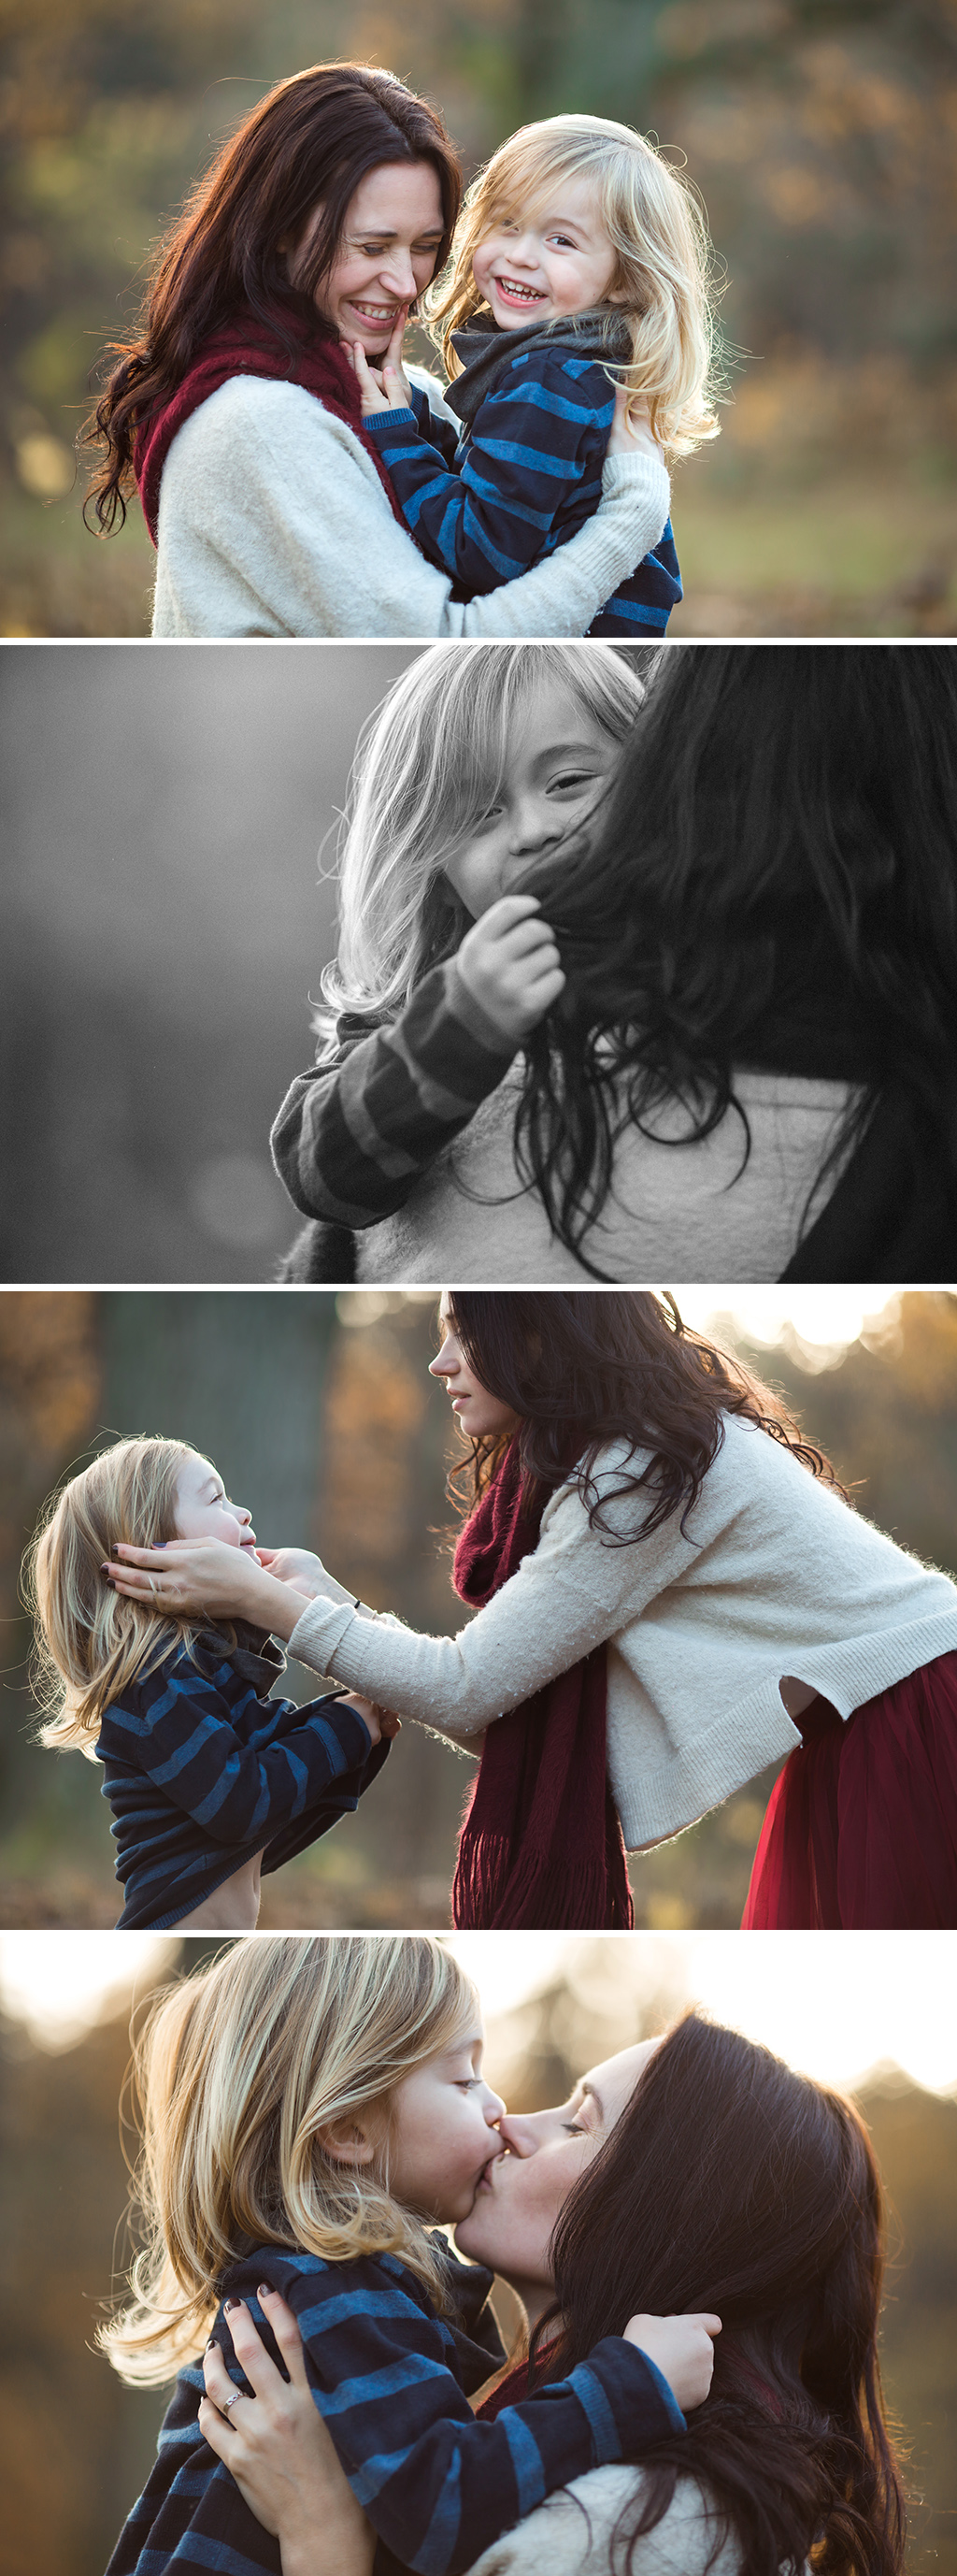 Hostfotografering-i-november-familjefotografering-Stockholm-4.jpg